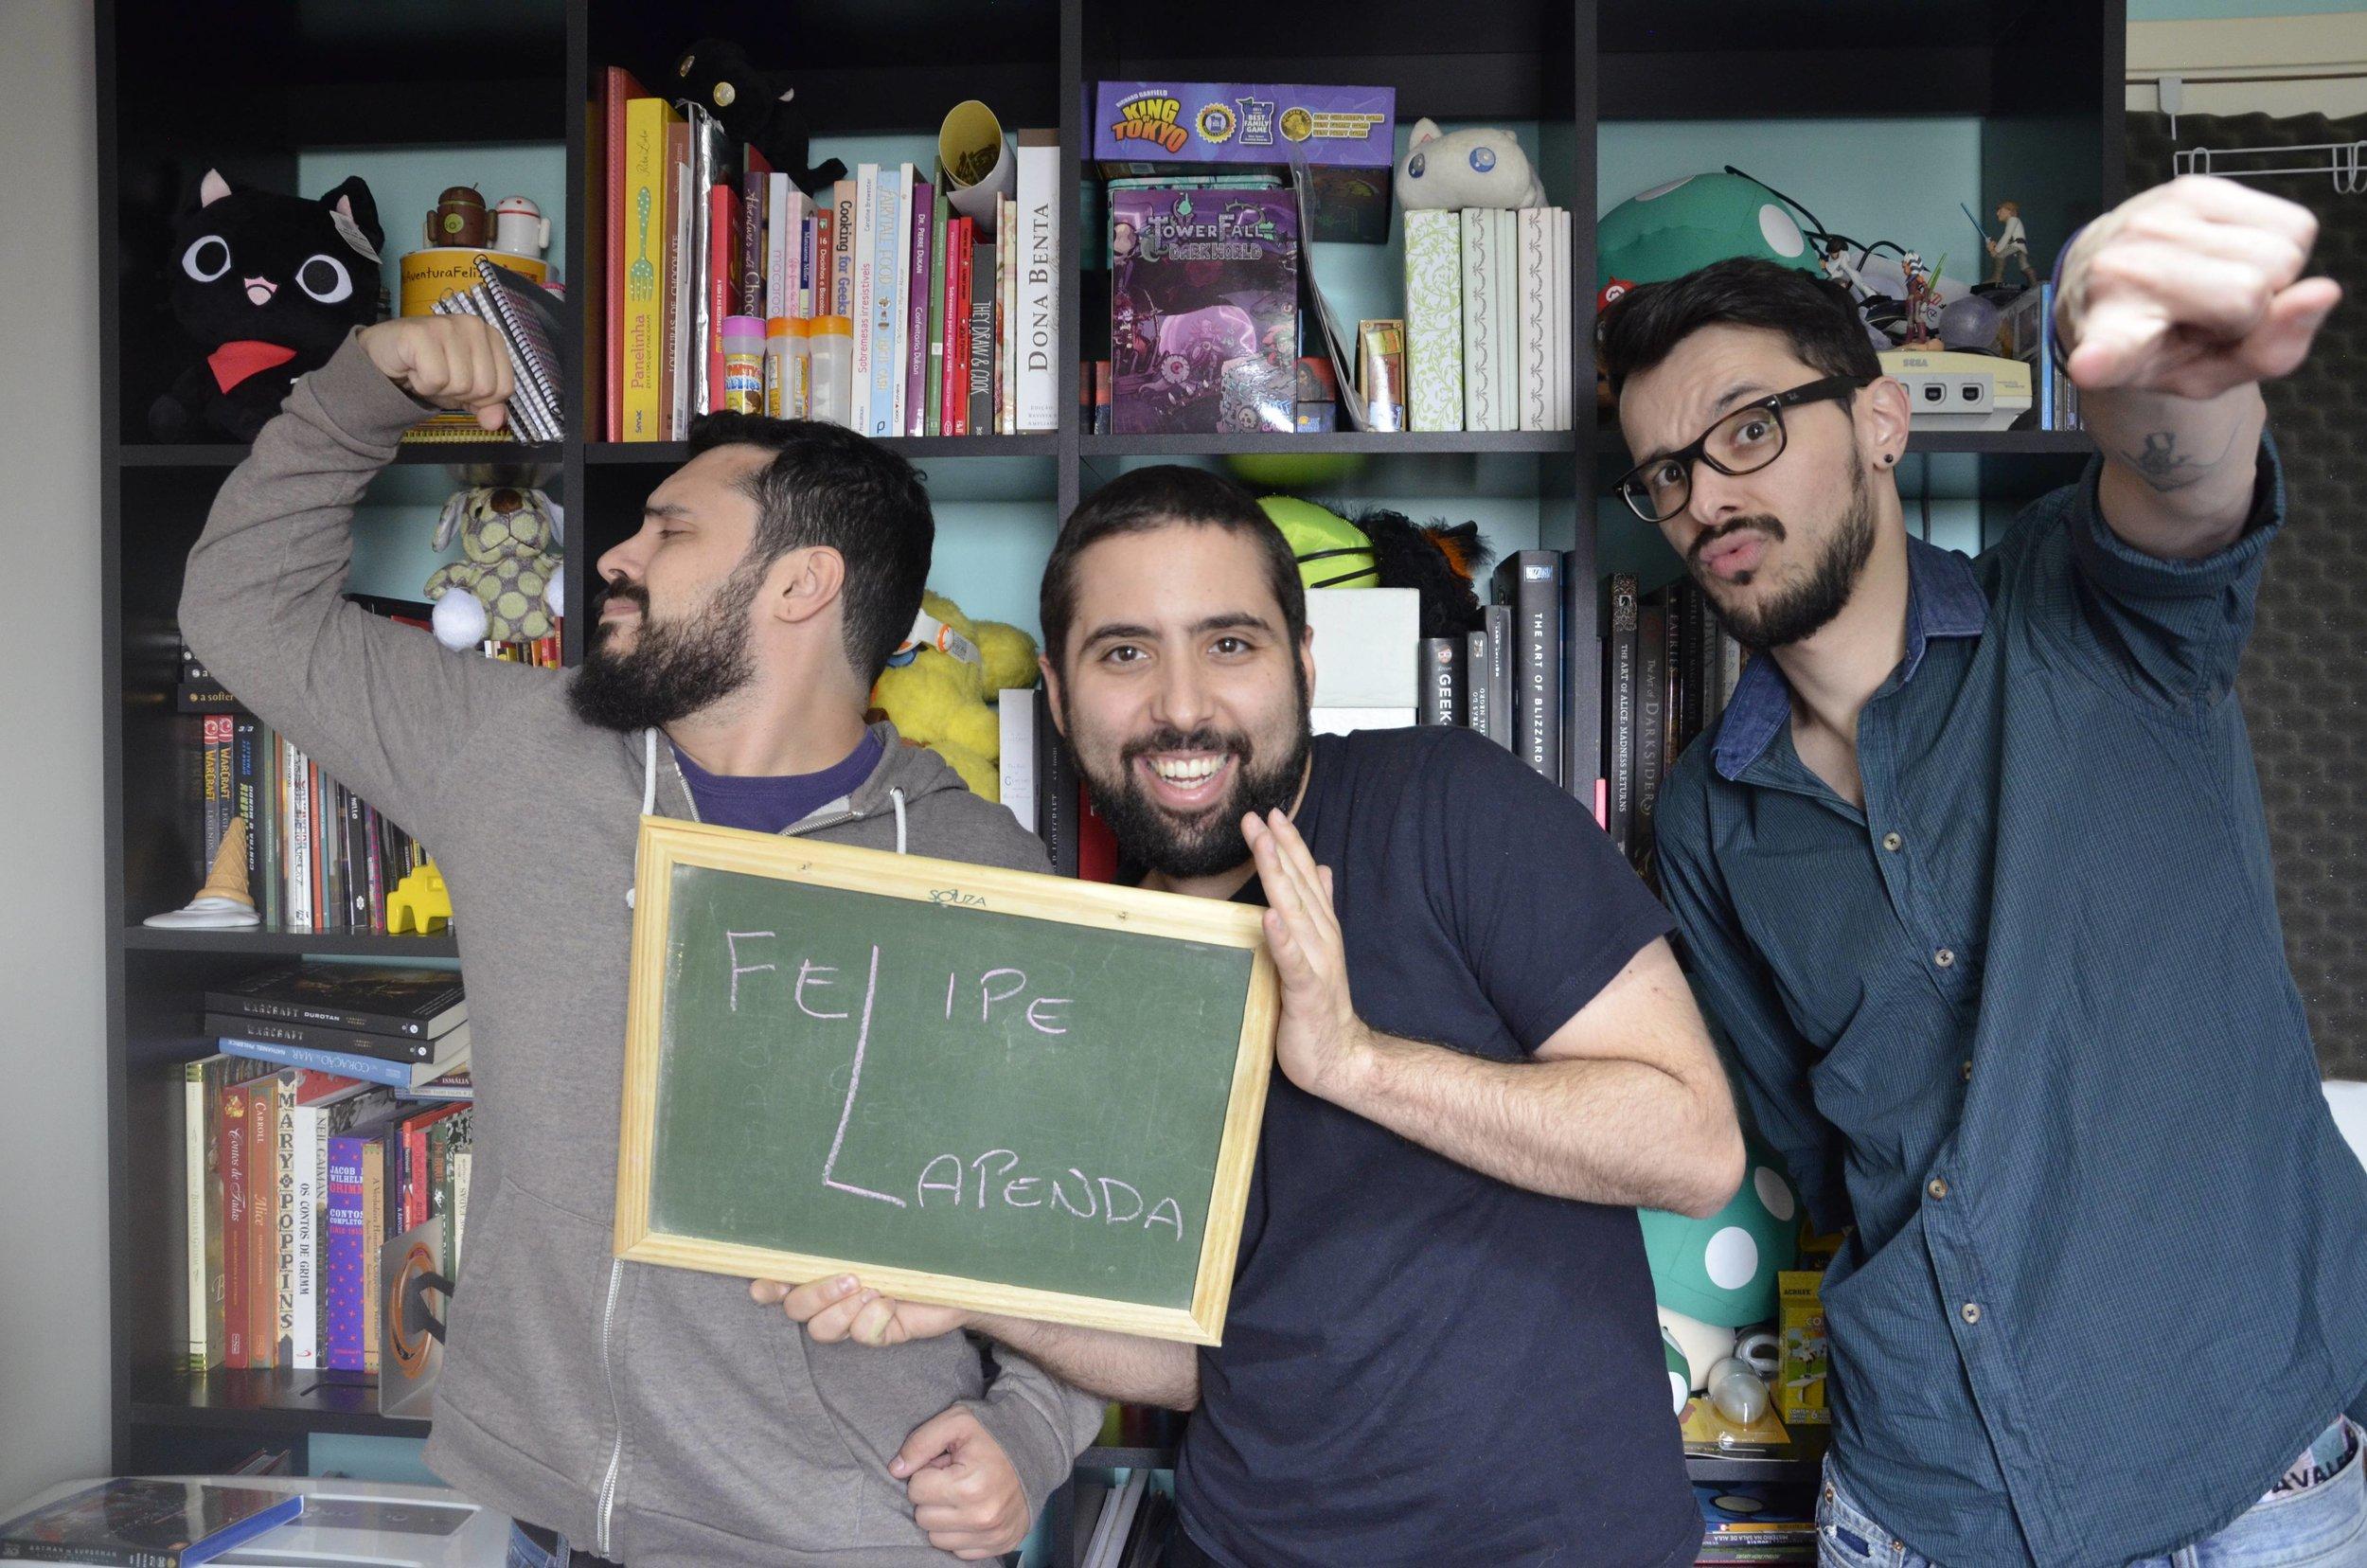 Felipe-Lapenda.jpg